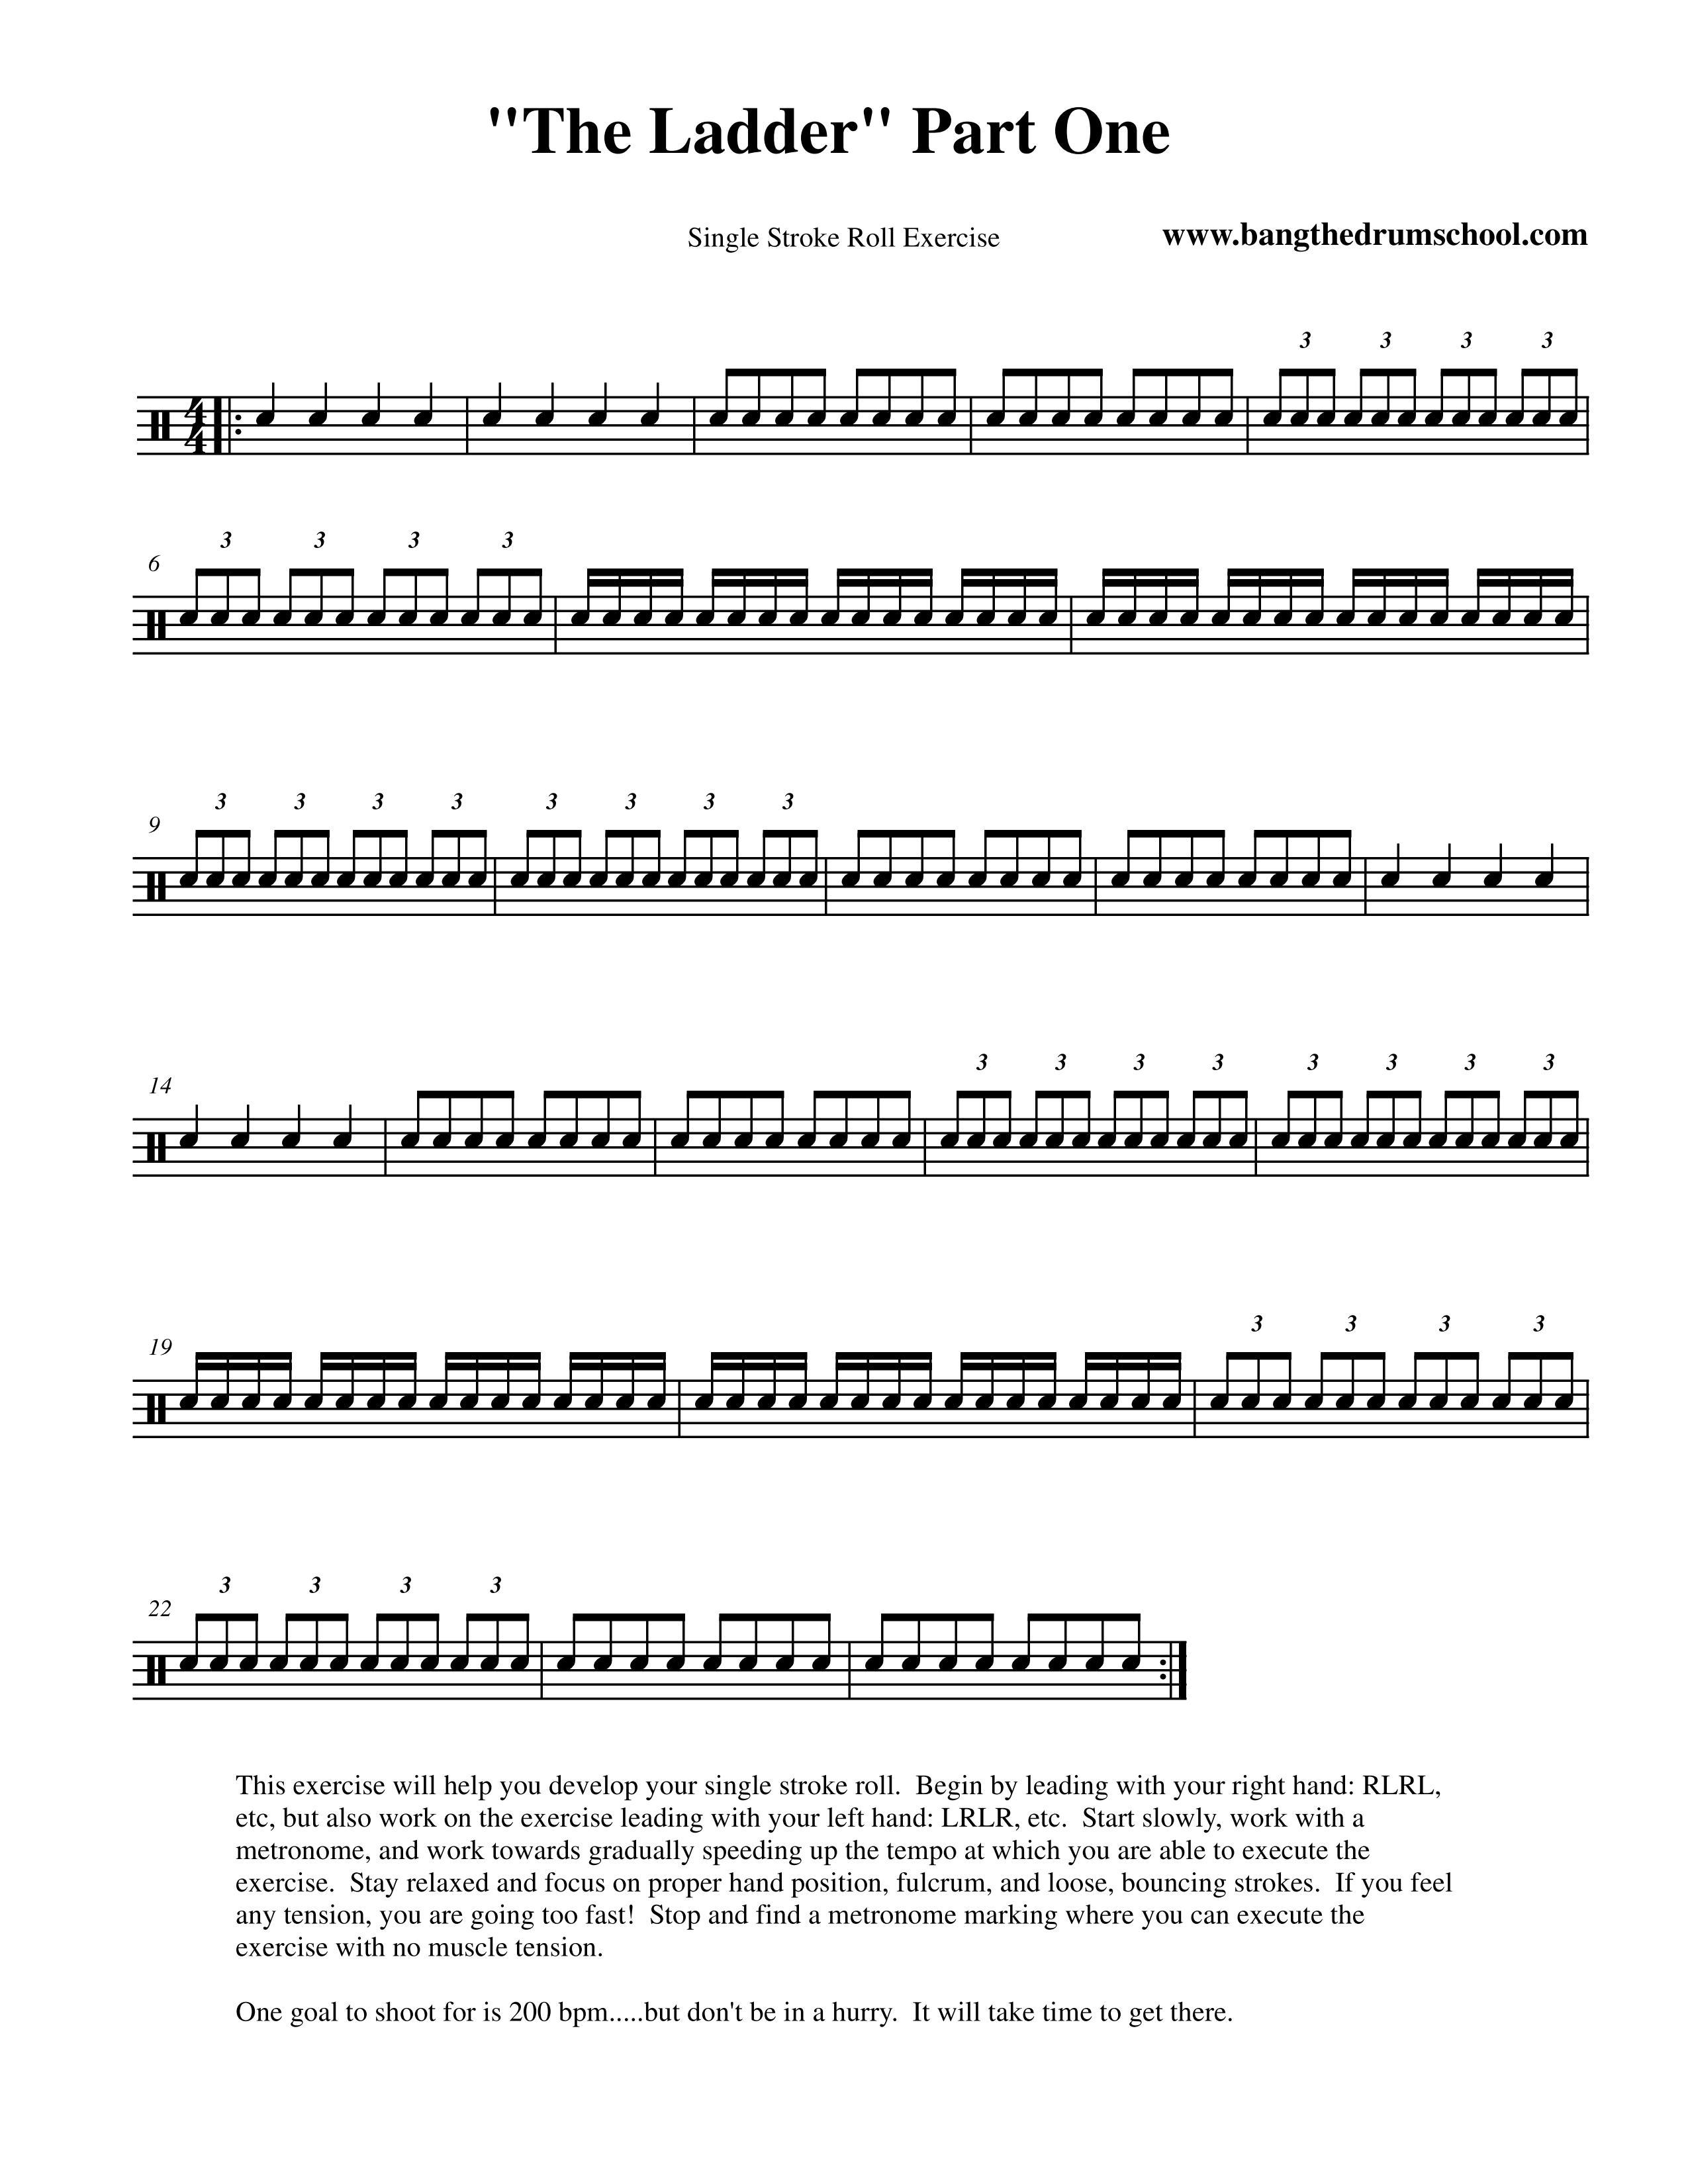 Single stroke roll exercises pdf